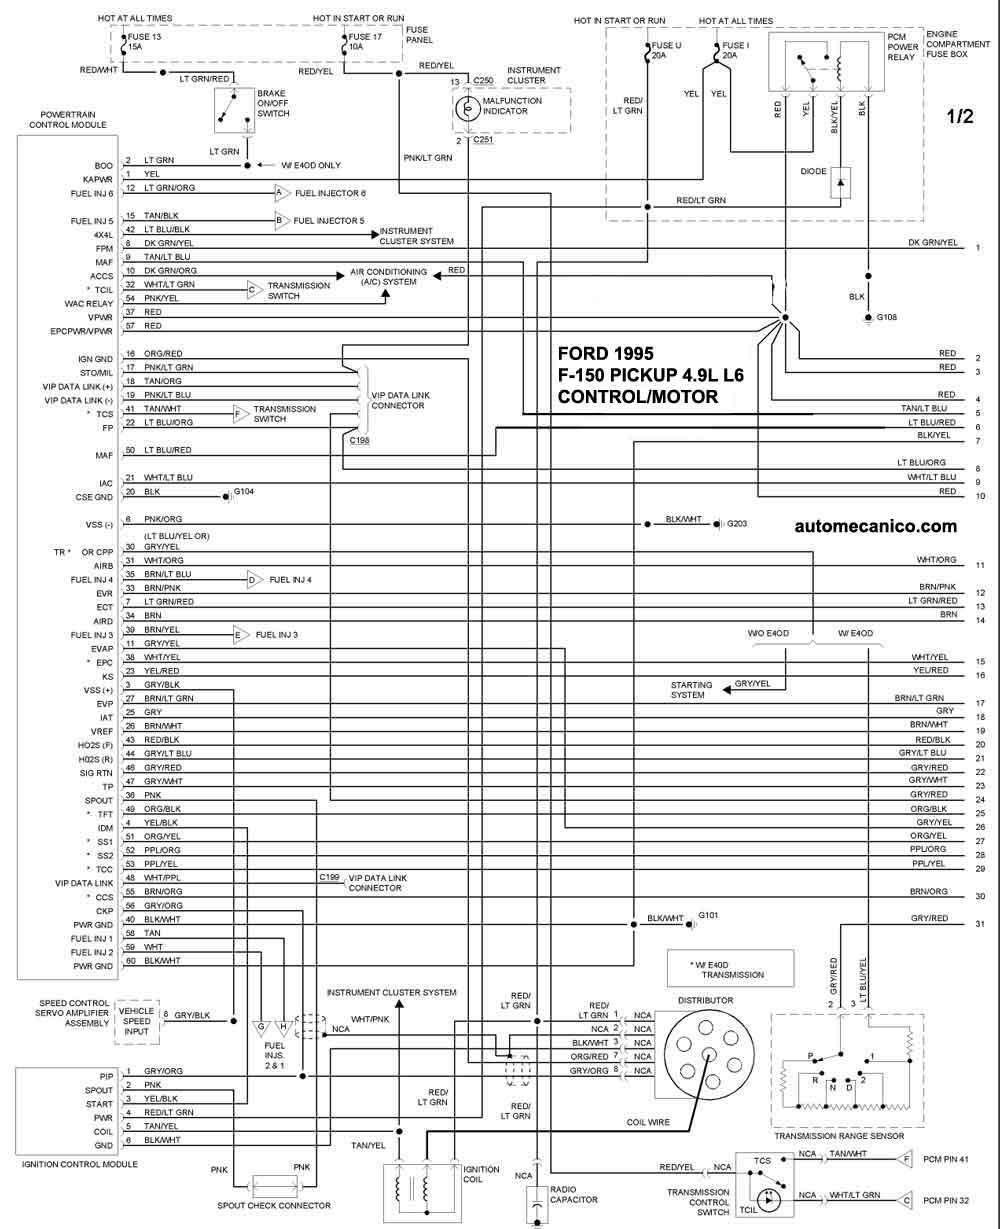 ford -1995 - diagramas control del motor - graphics - esquemas